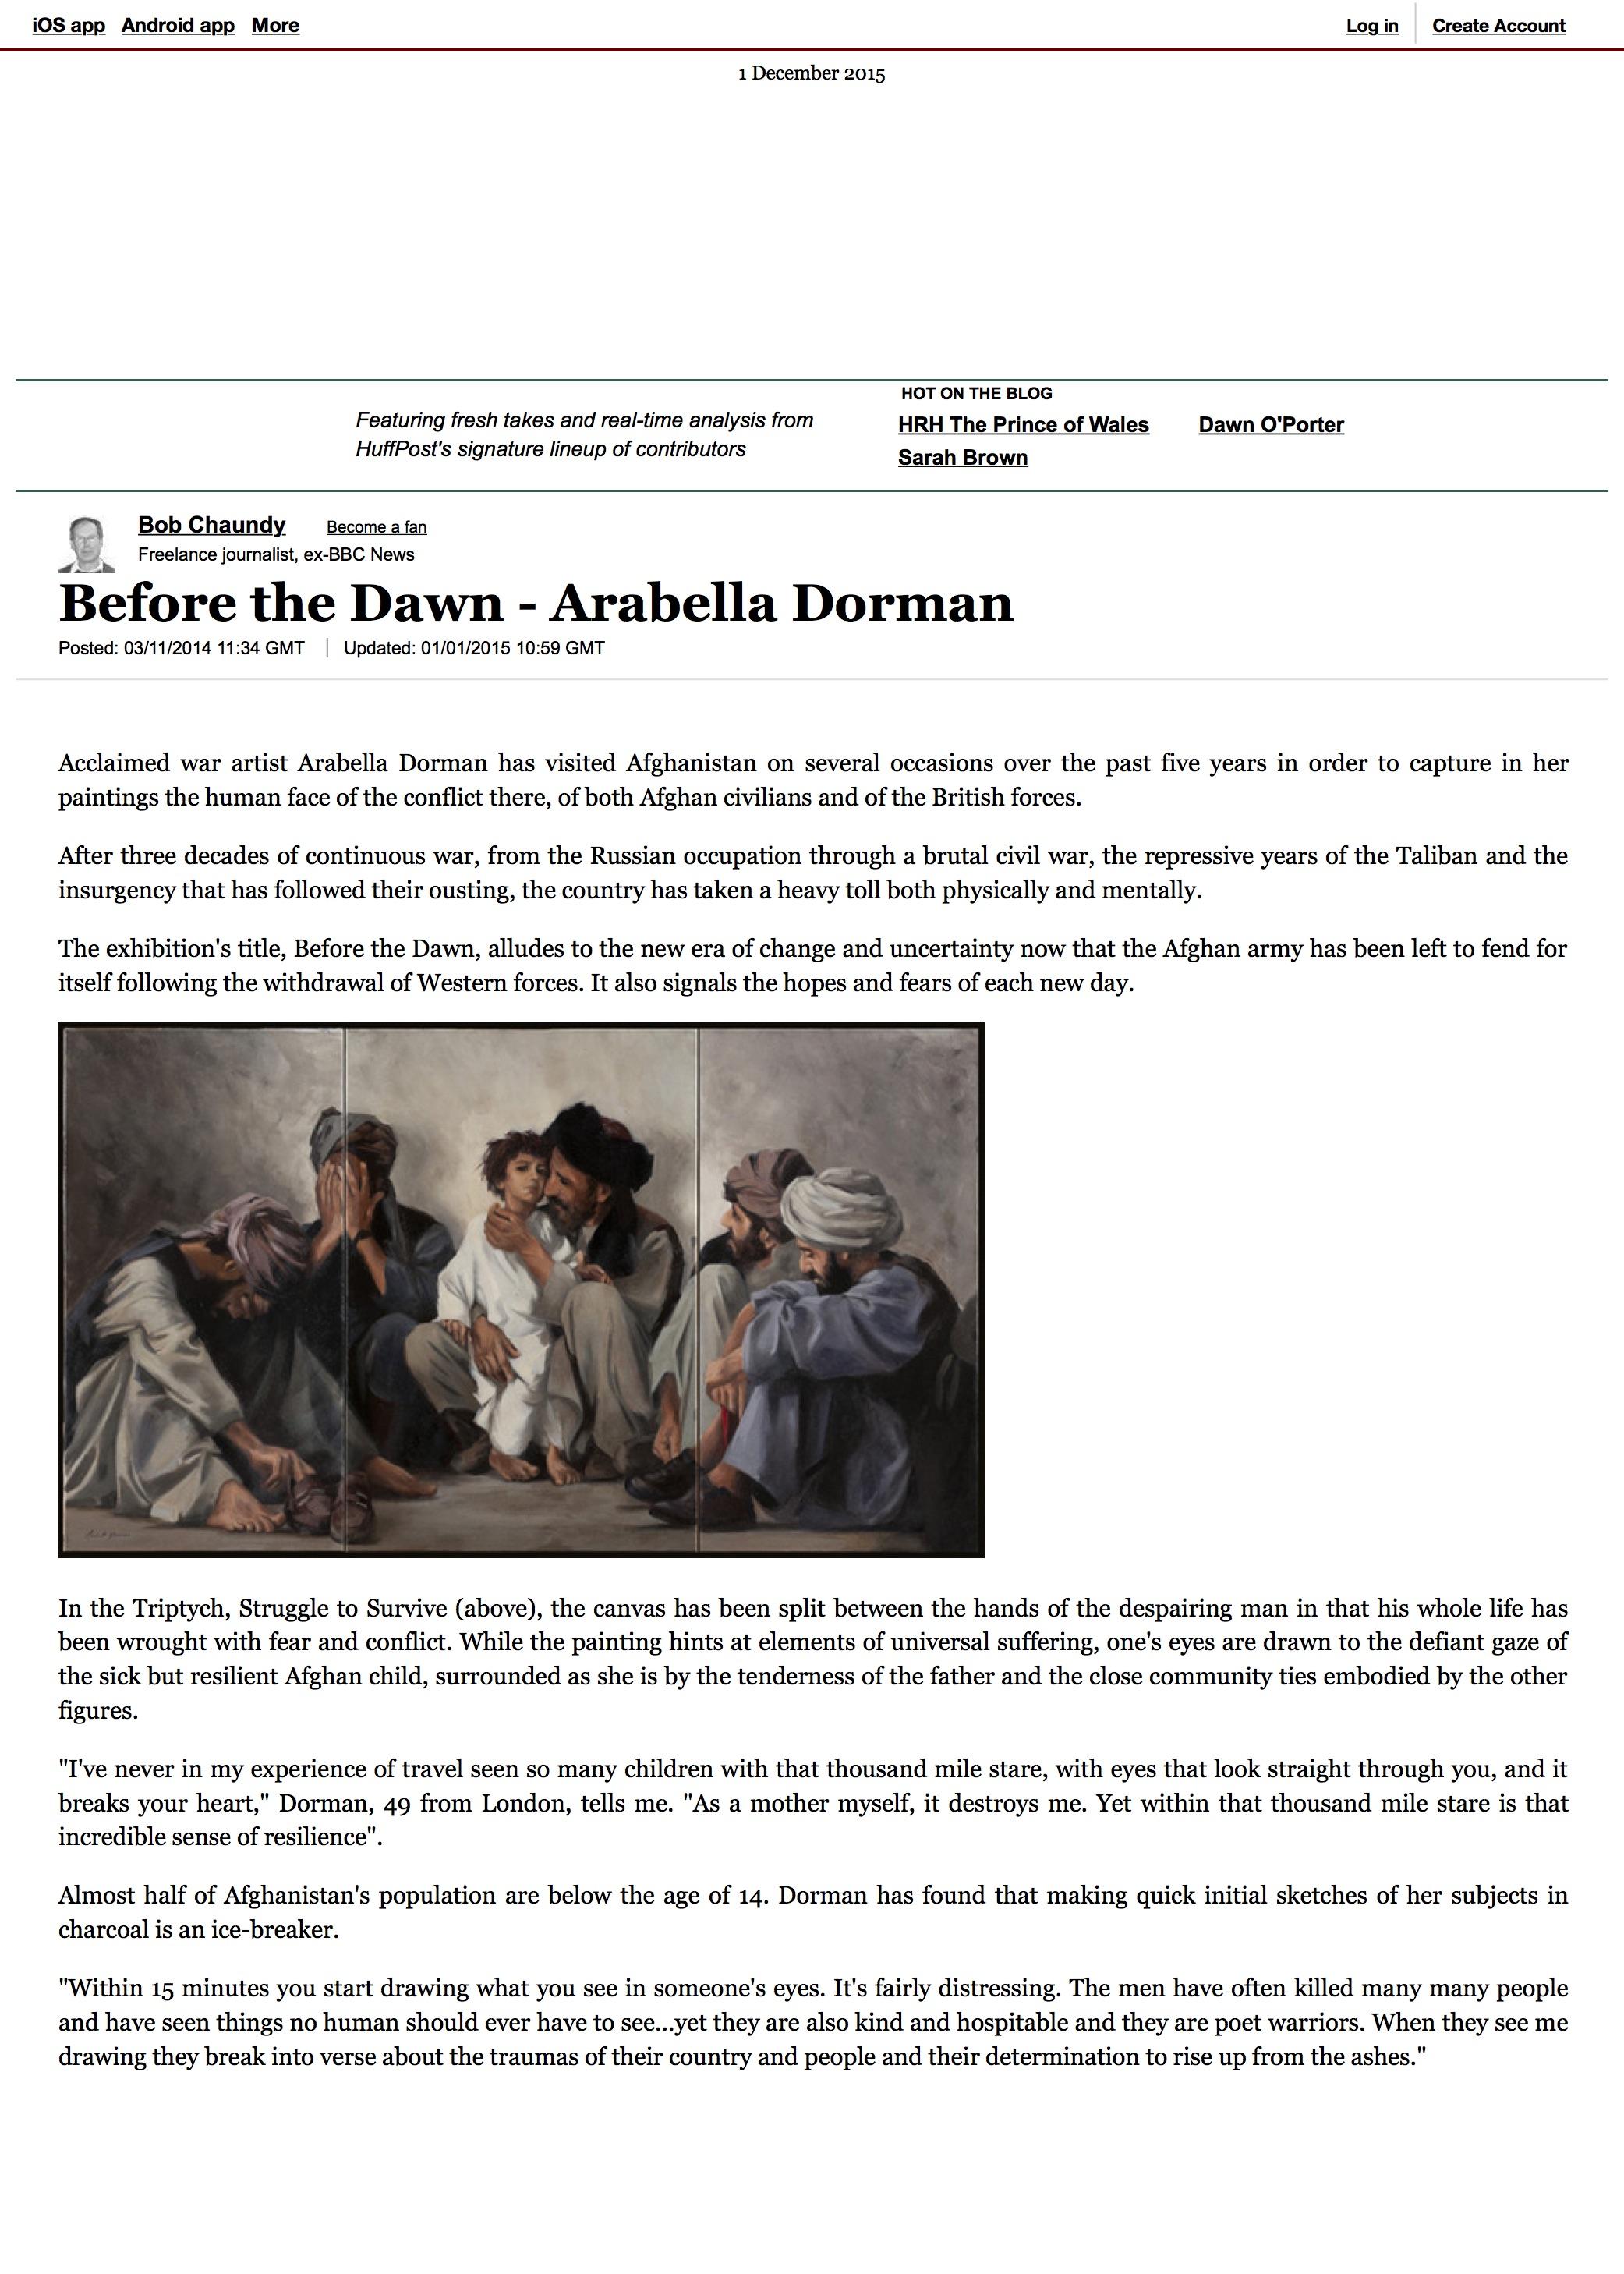 Before the Dawn - Arabella Dorman|Bob Chaundy.jpg